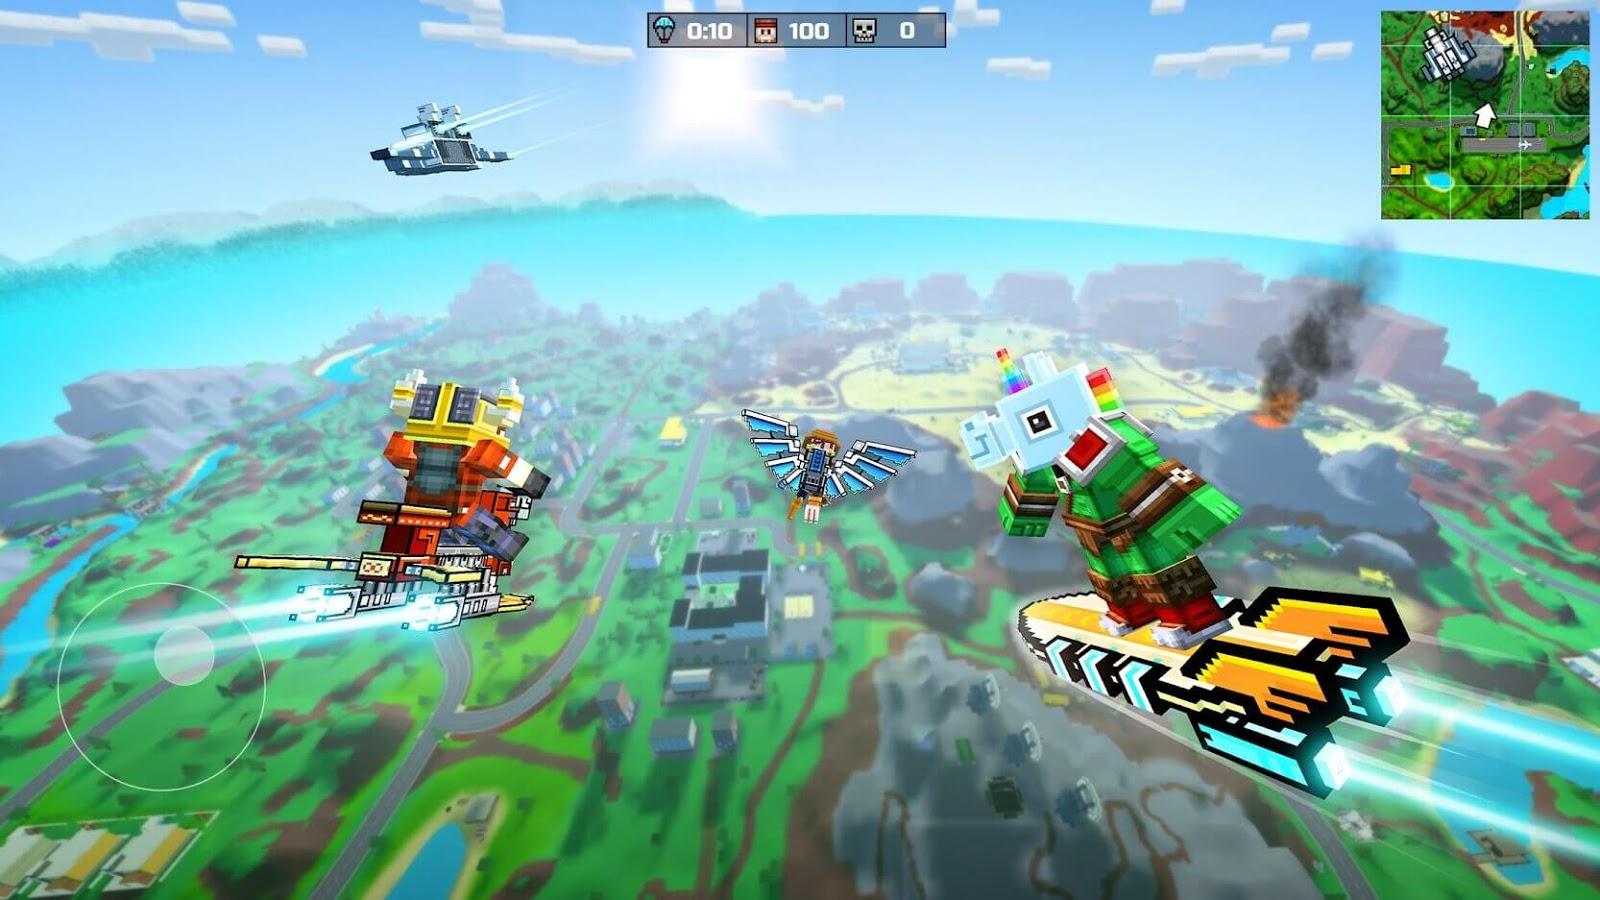 Pixel Gun 3D:لعبة Battle Royale اللعبة مصممة بالبكسل (كتل مربعة) مثل Minecraft